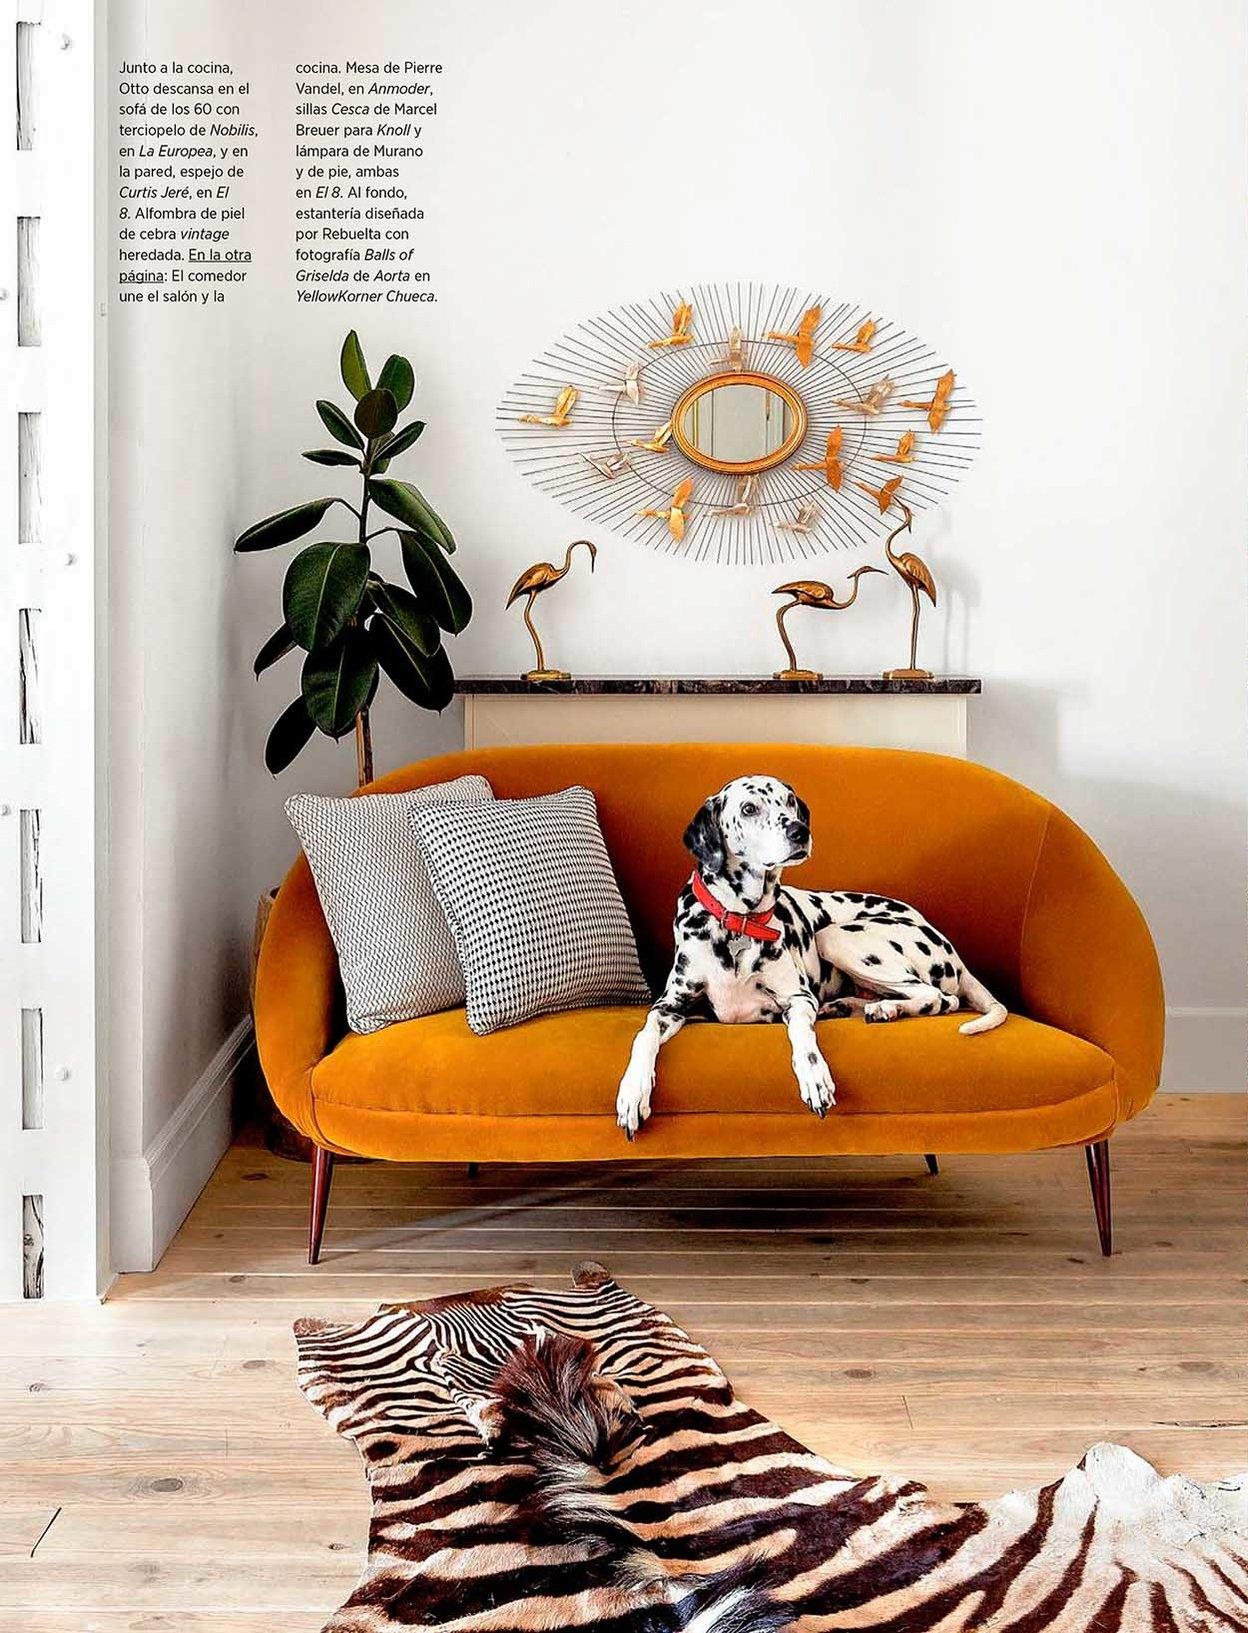 Salesas Apartment Interior by Carmen Rebuelta, Madrid as seen in AD España issue January 2018/ Photo credit: Belen Imaz.